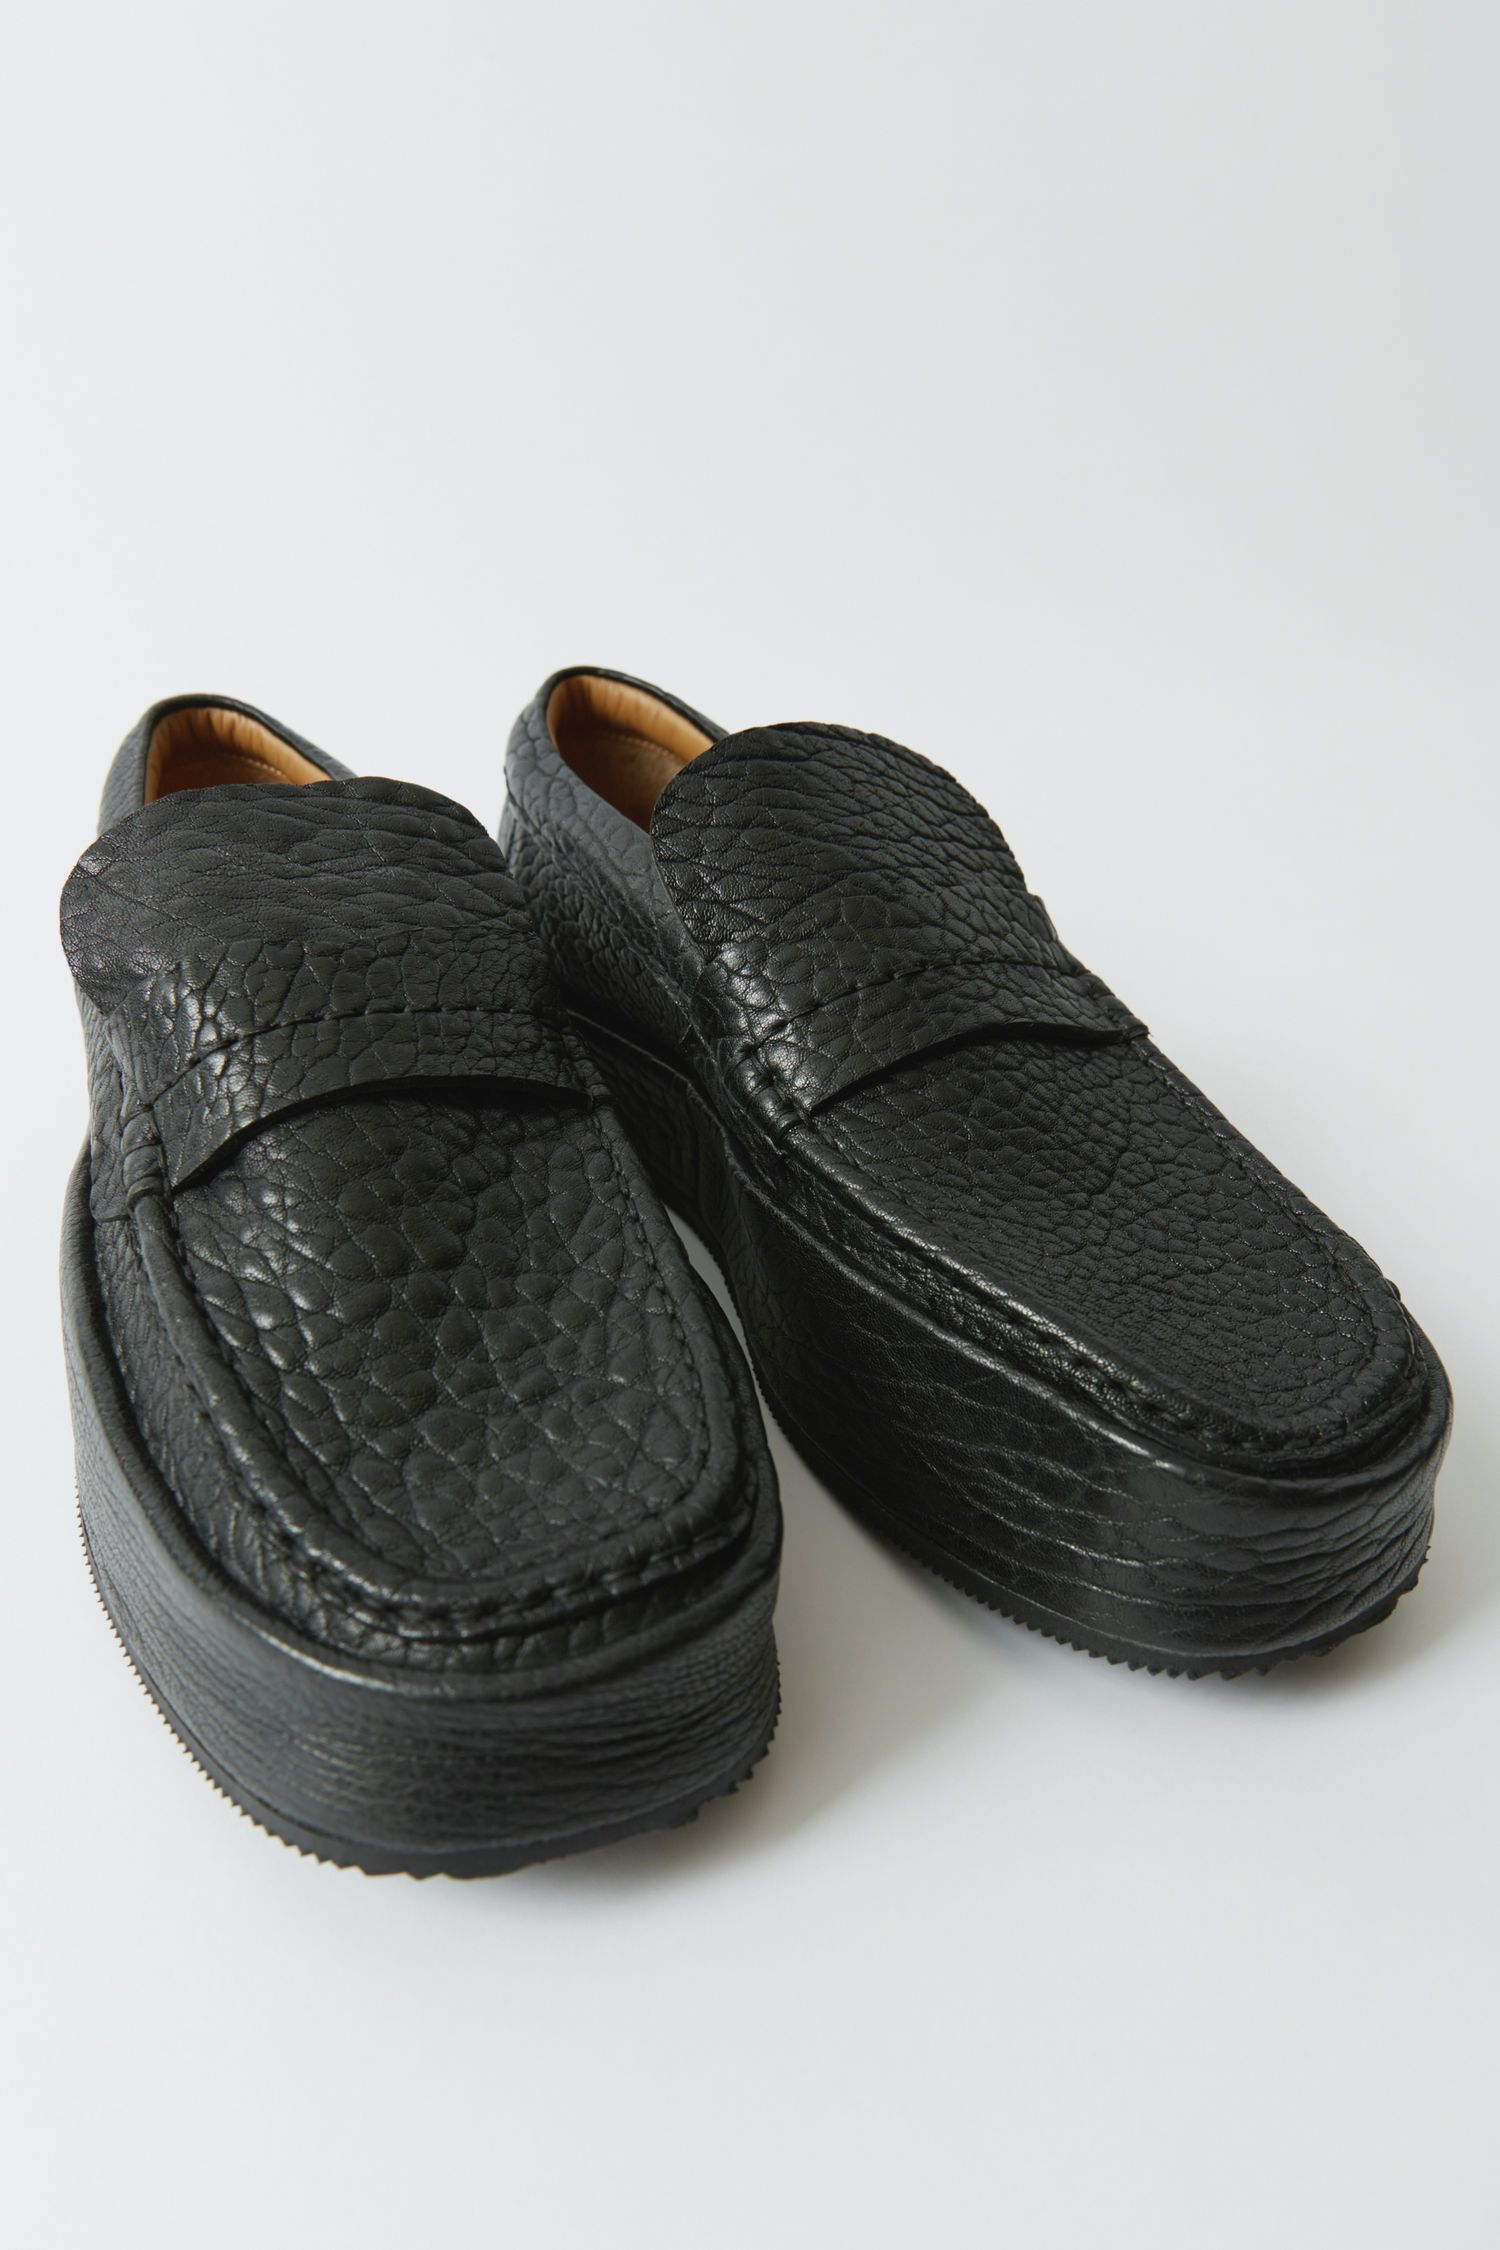 Acne Studios - Minimal loafers Black